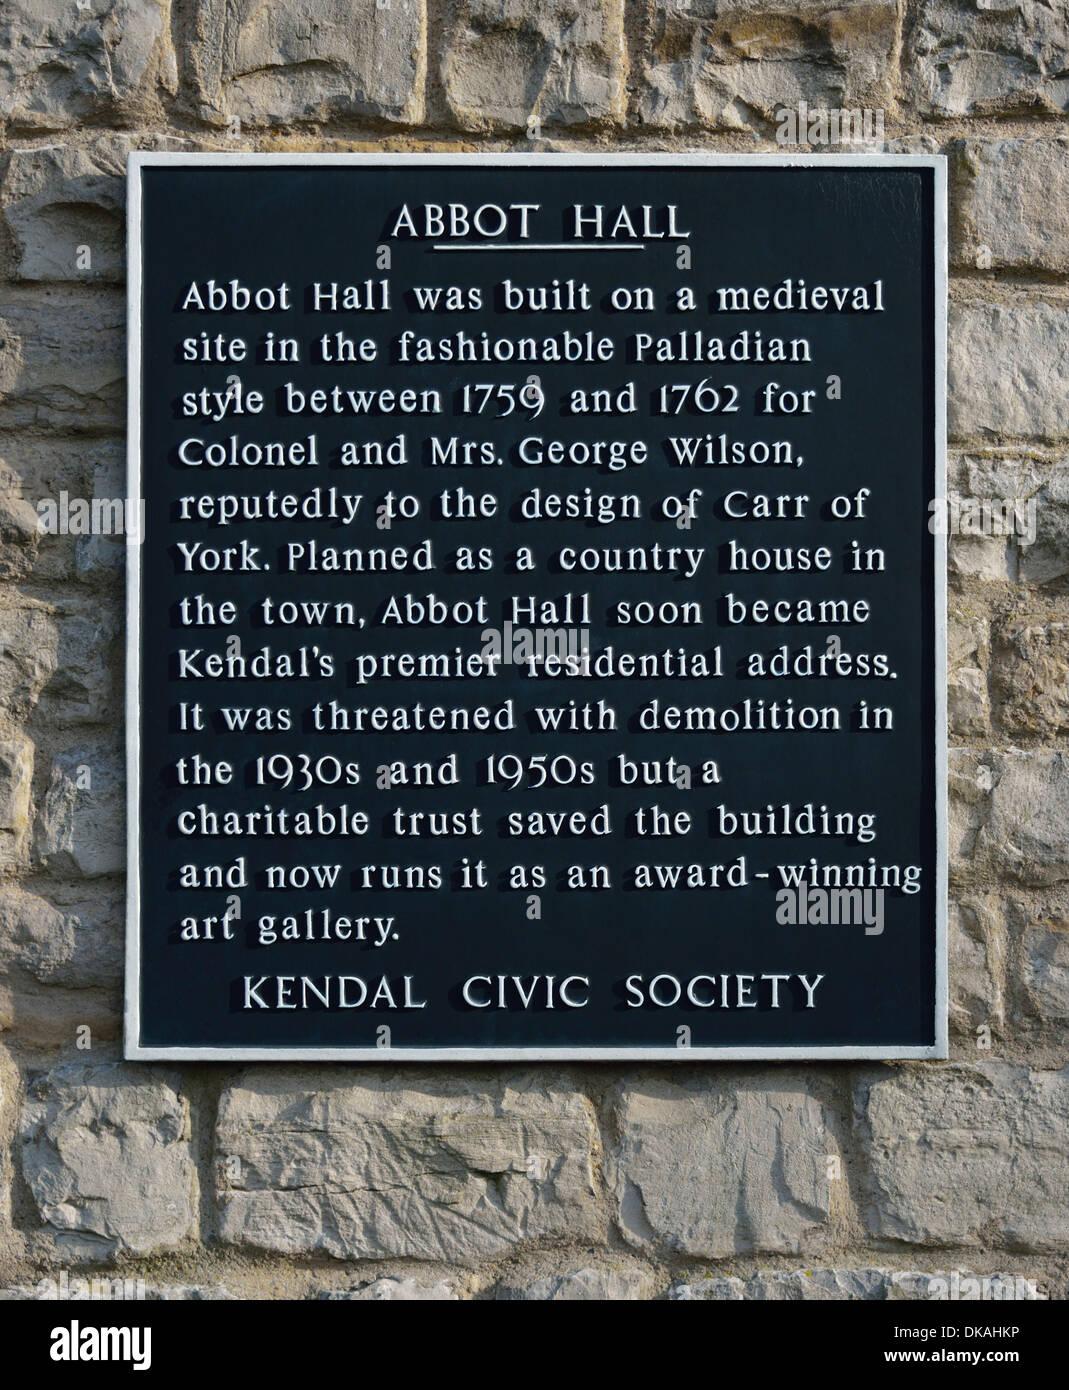 Descriptive plaque. Abbot Hall, Kendal, Cumbria, England, United Kingdom, Europe. - Stock Image